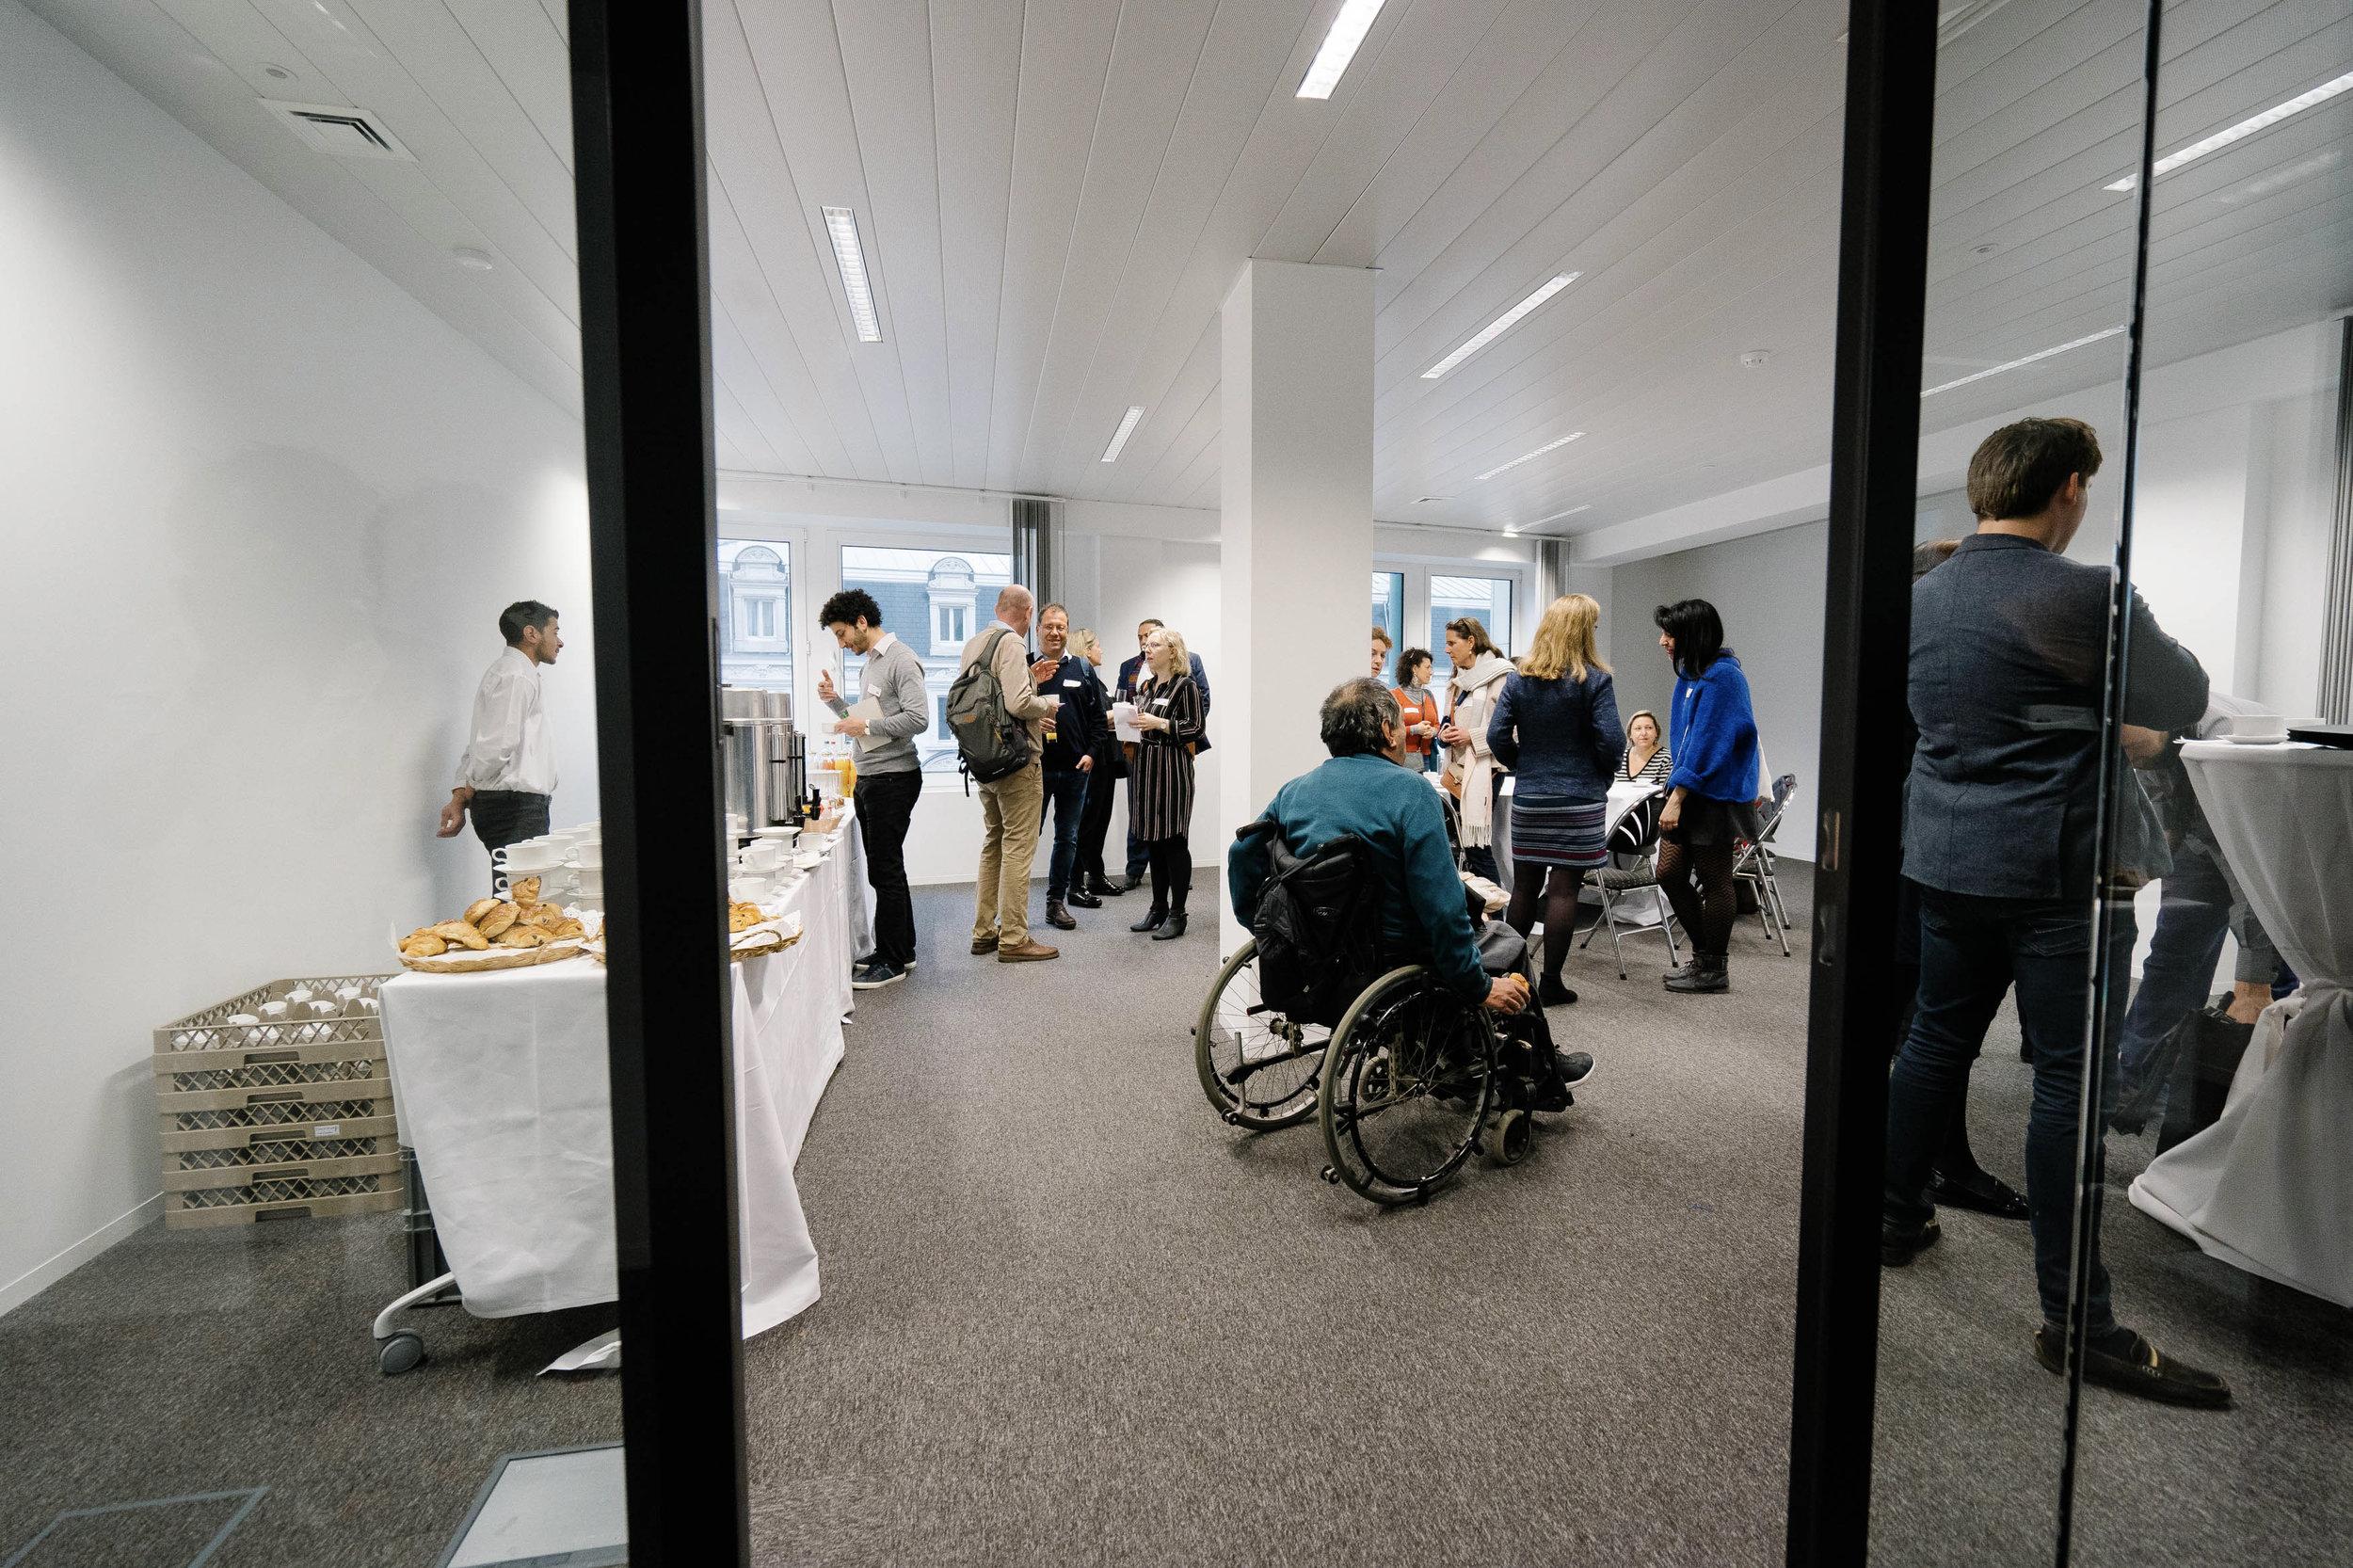 photographe-conference-bruxelles-corporate-4.jpg